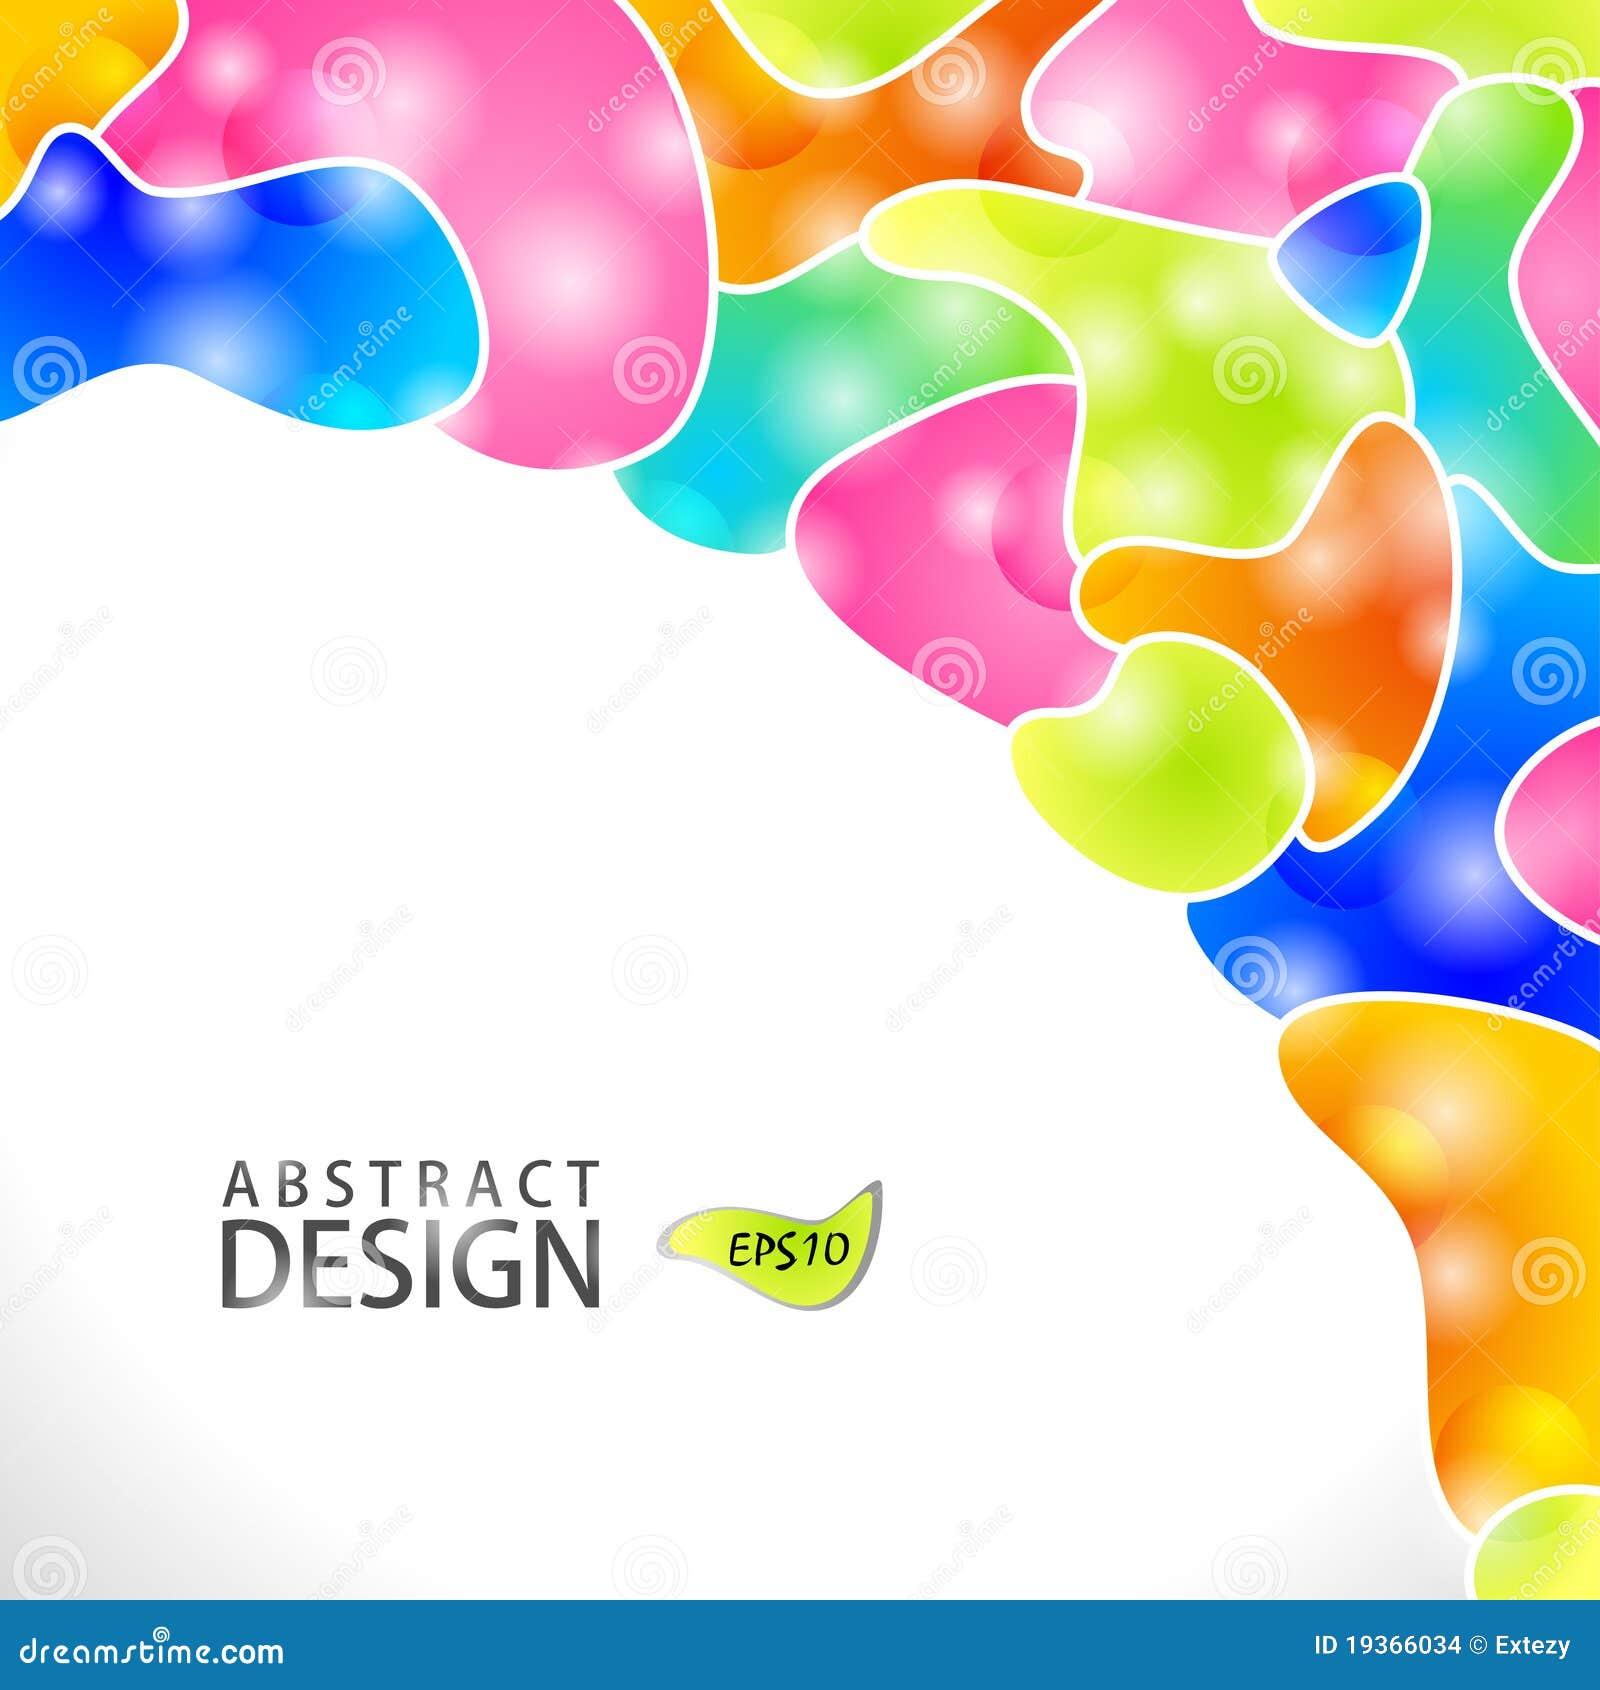 abstract modern website background design stock vector